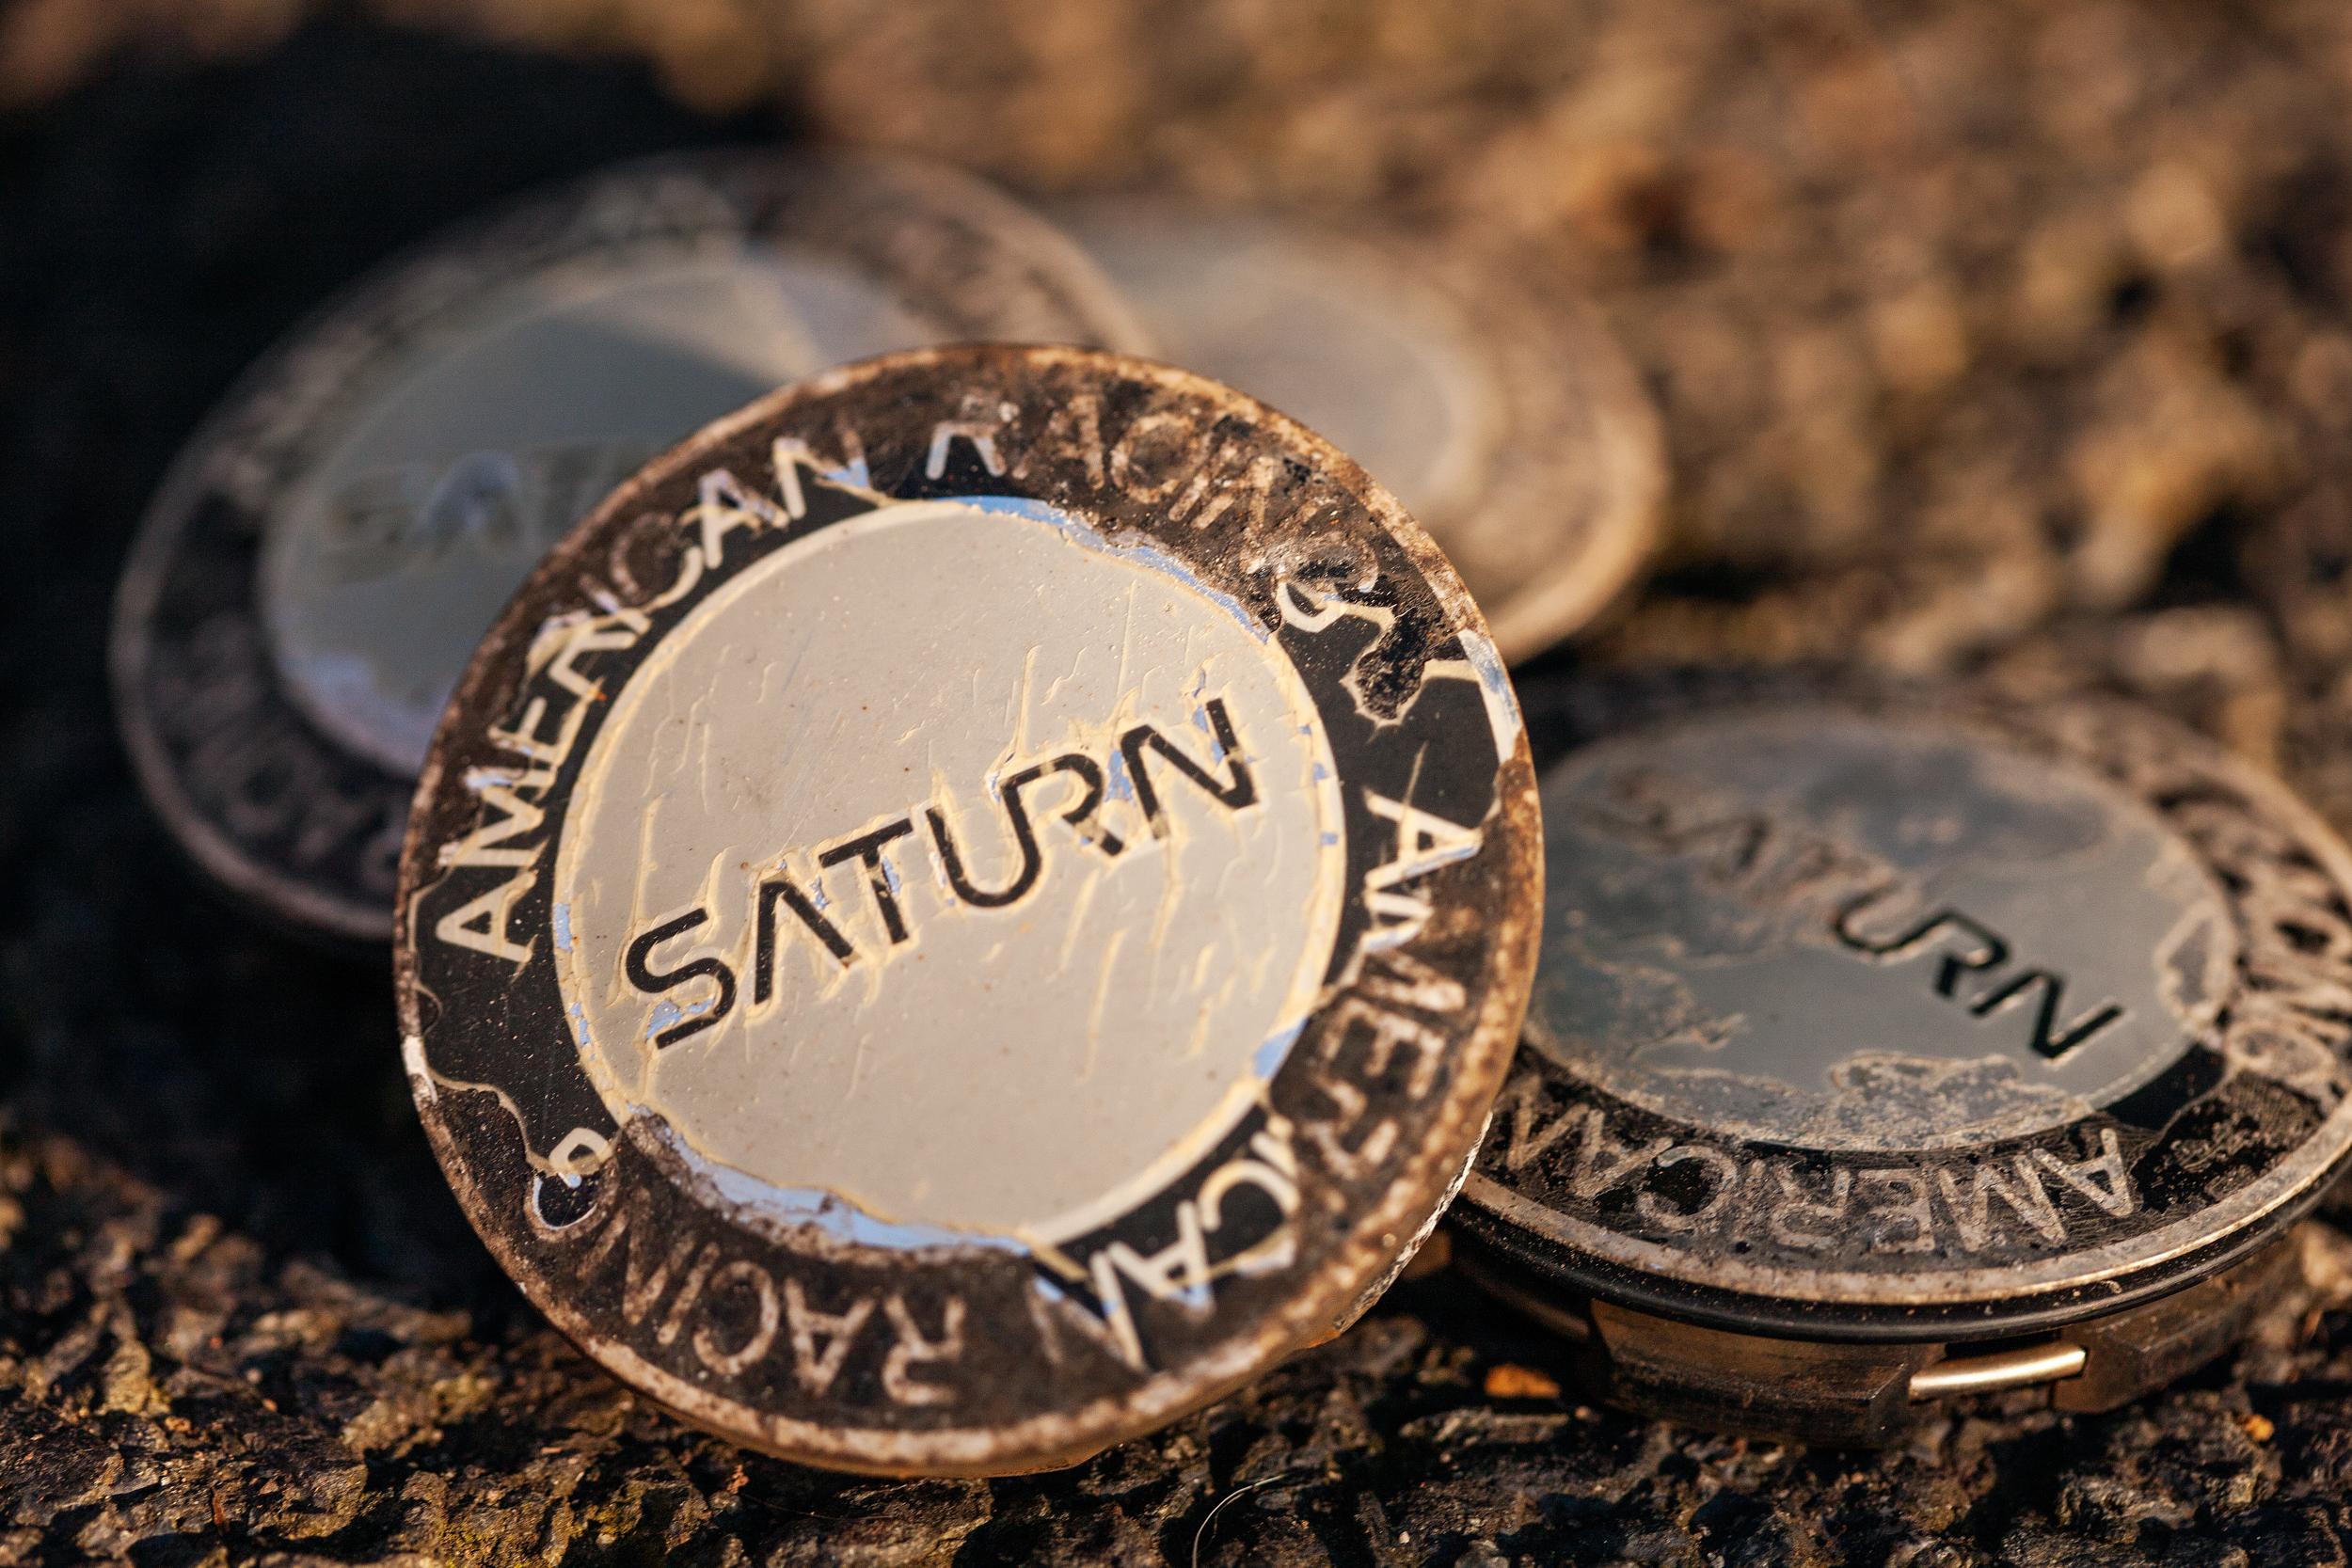 saturn racing chip detail